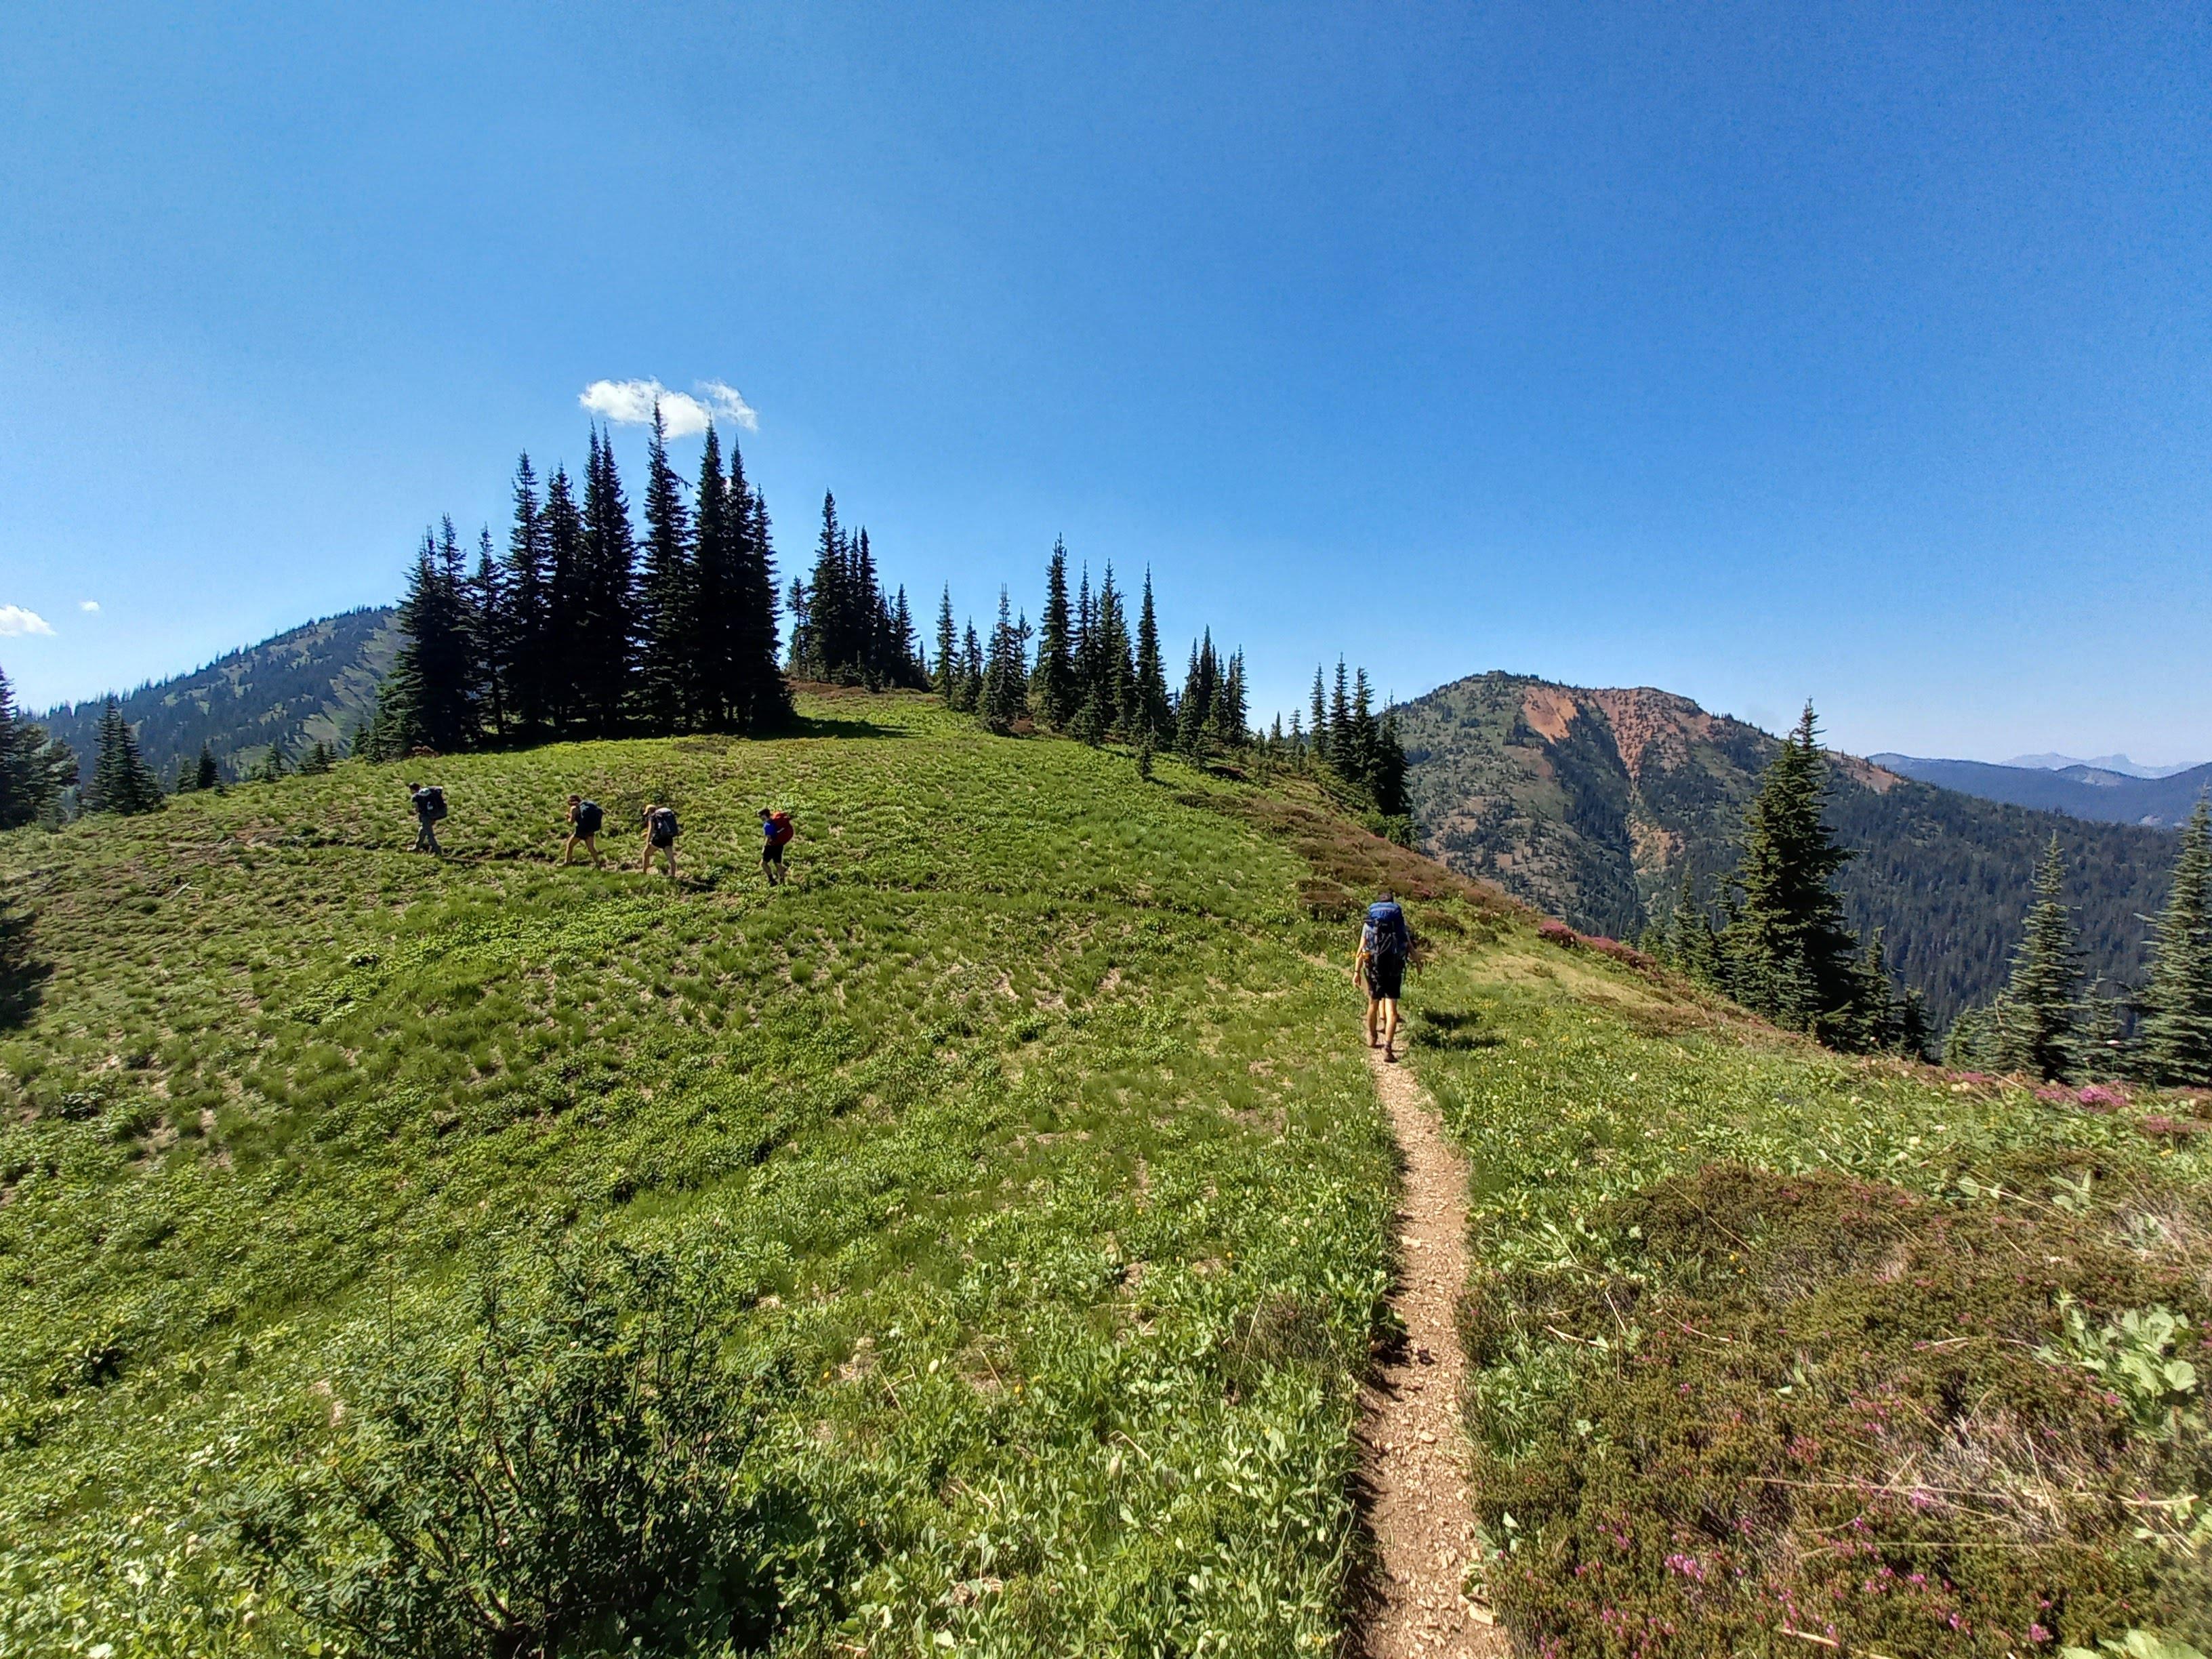 Typical alpine terrain on the Skyline Trail